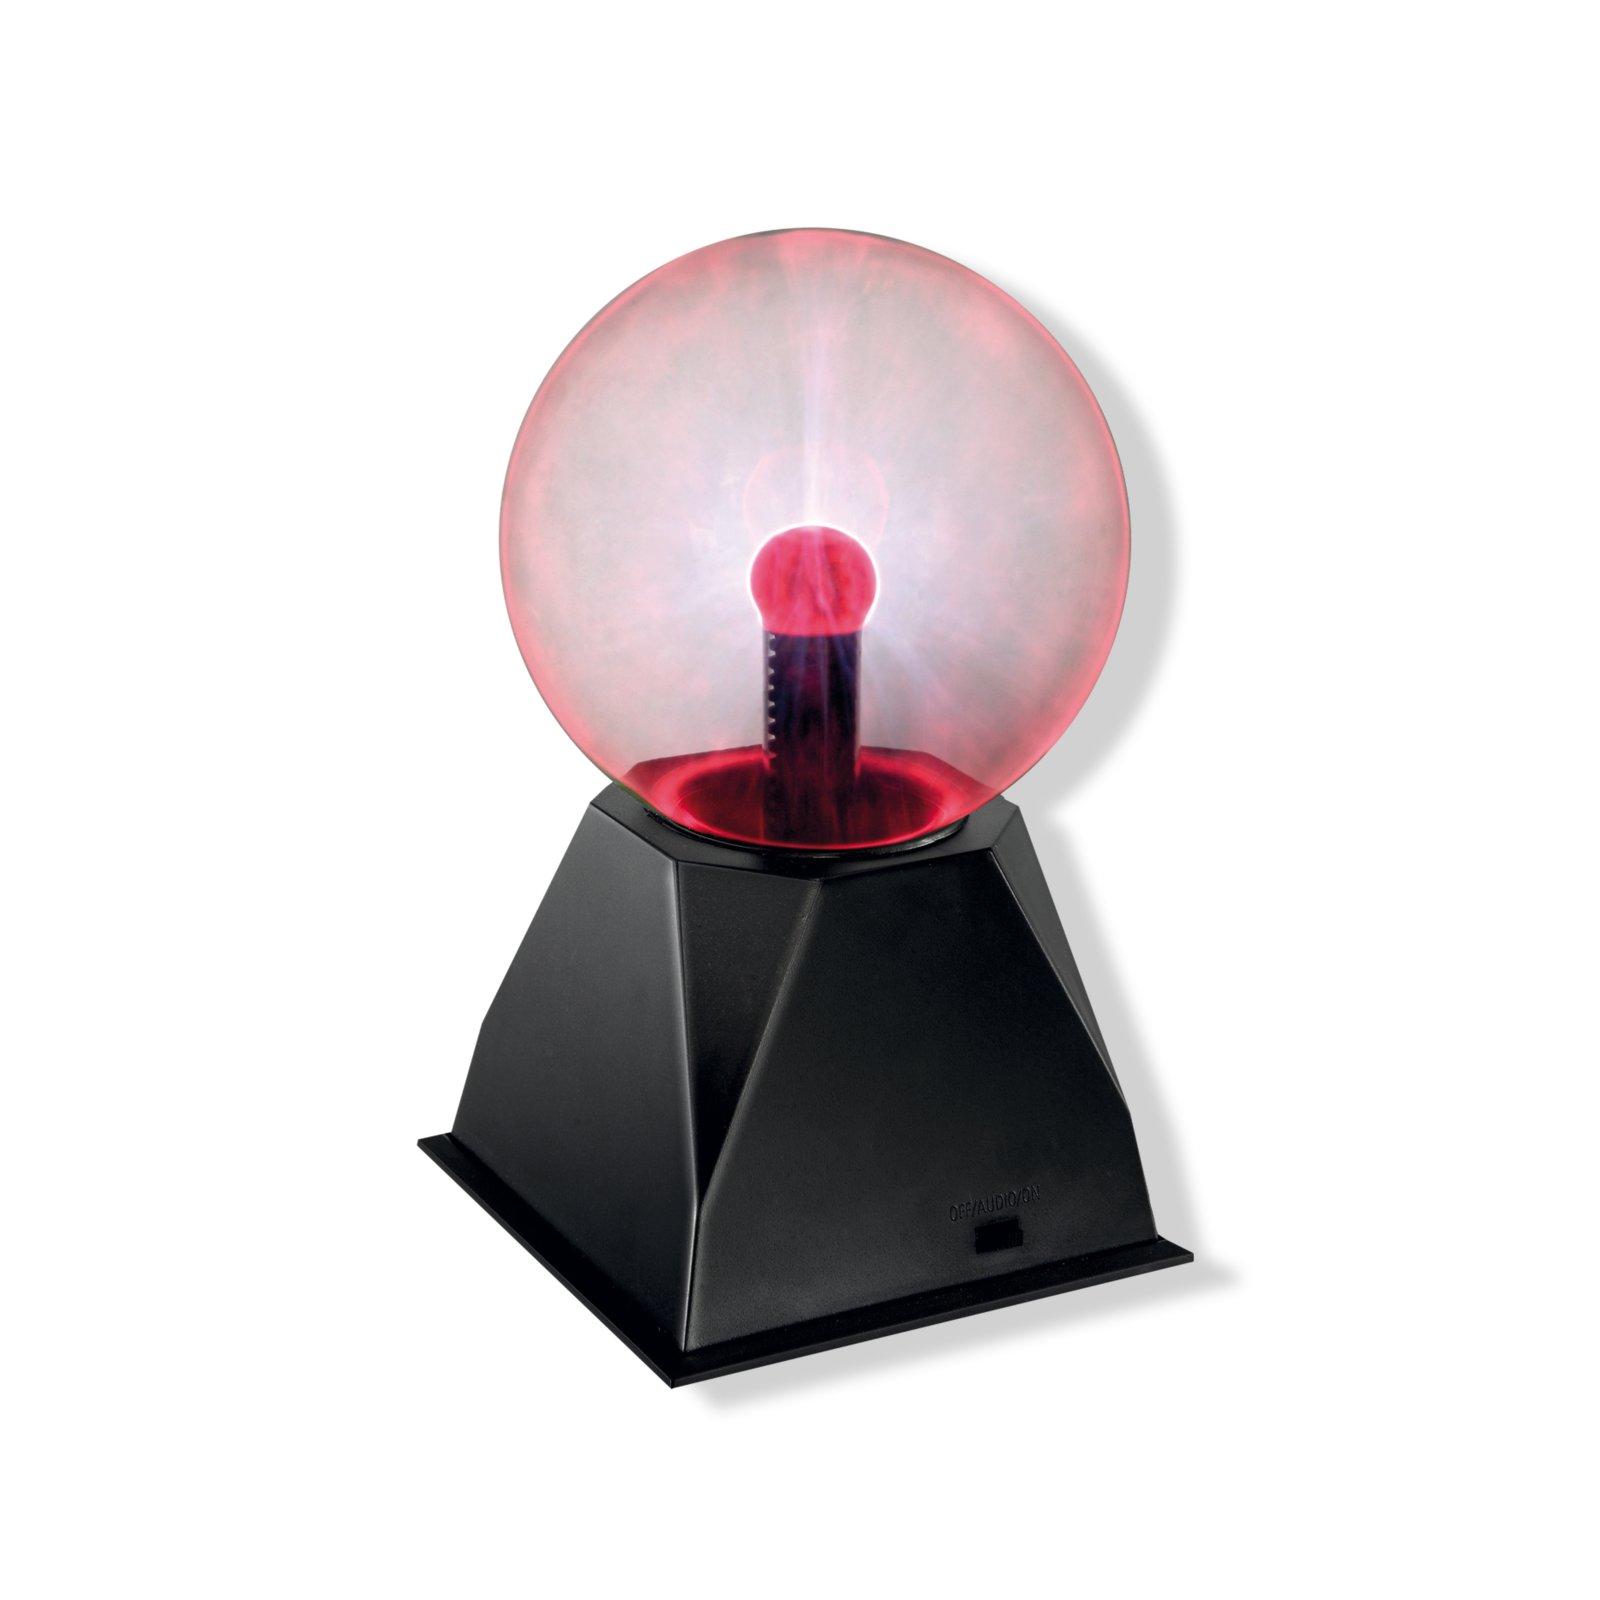 plasmaleuchte tischlampen lampen roller m belhaus. Black Bedroom Furniture Sets. Home Design Ideas